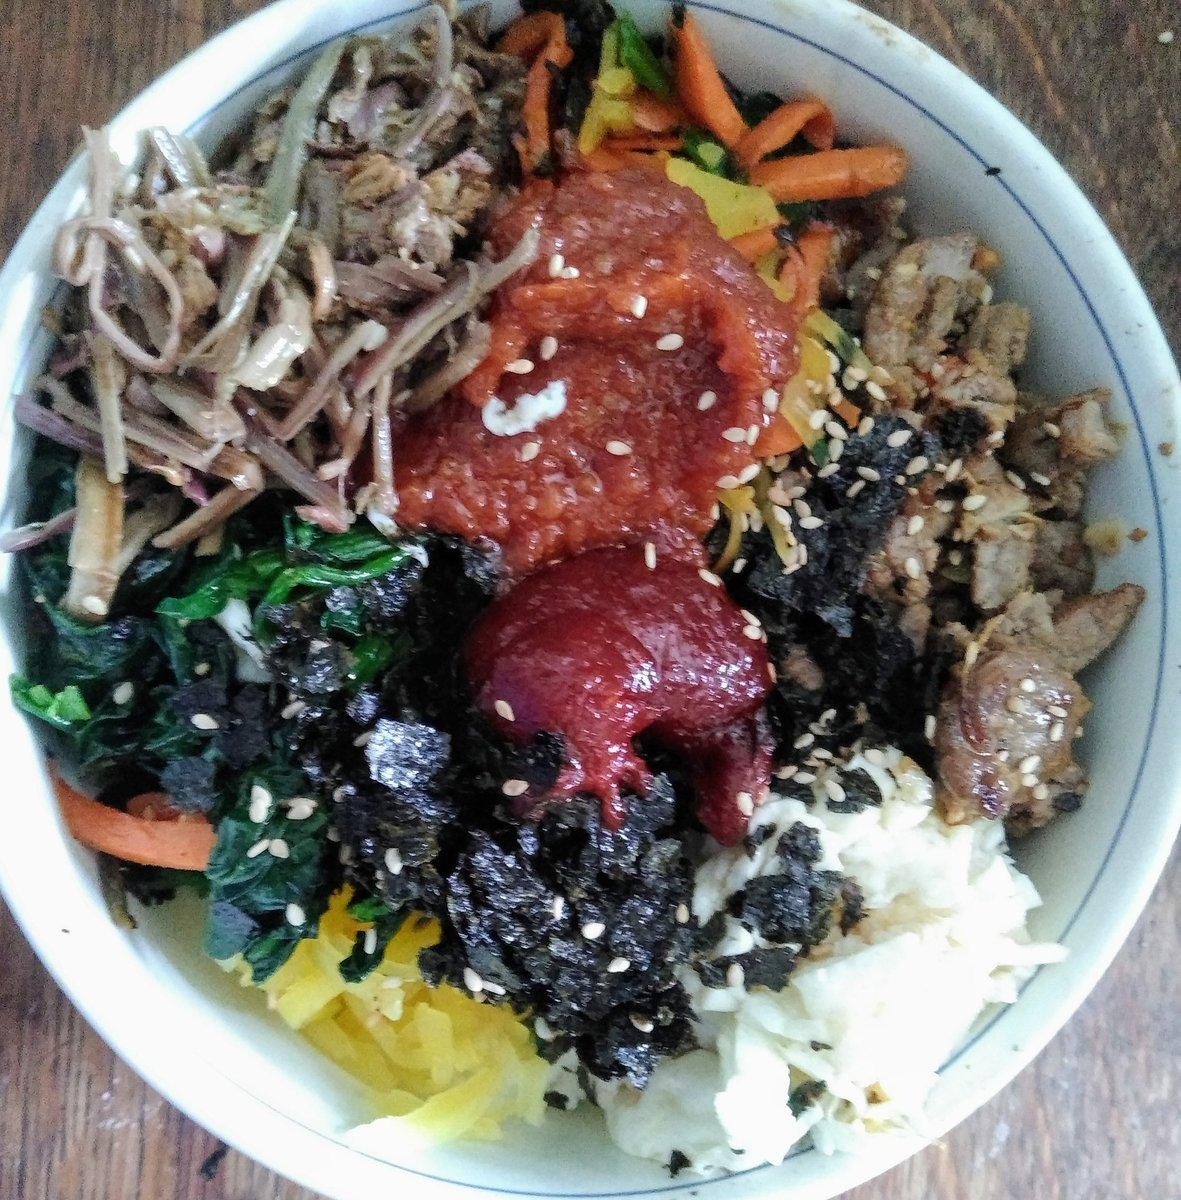 #koreanfood during covid-19 restrictions, chefs keep cooking #cooking #food #comfortfood #squid #dumplings #porkroast #soups